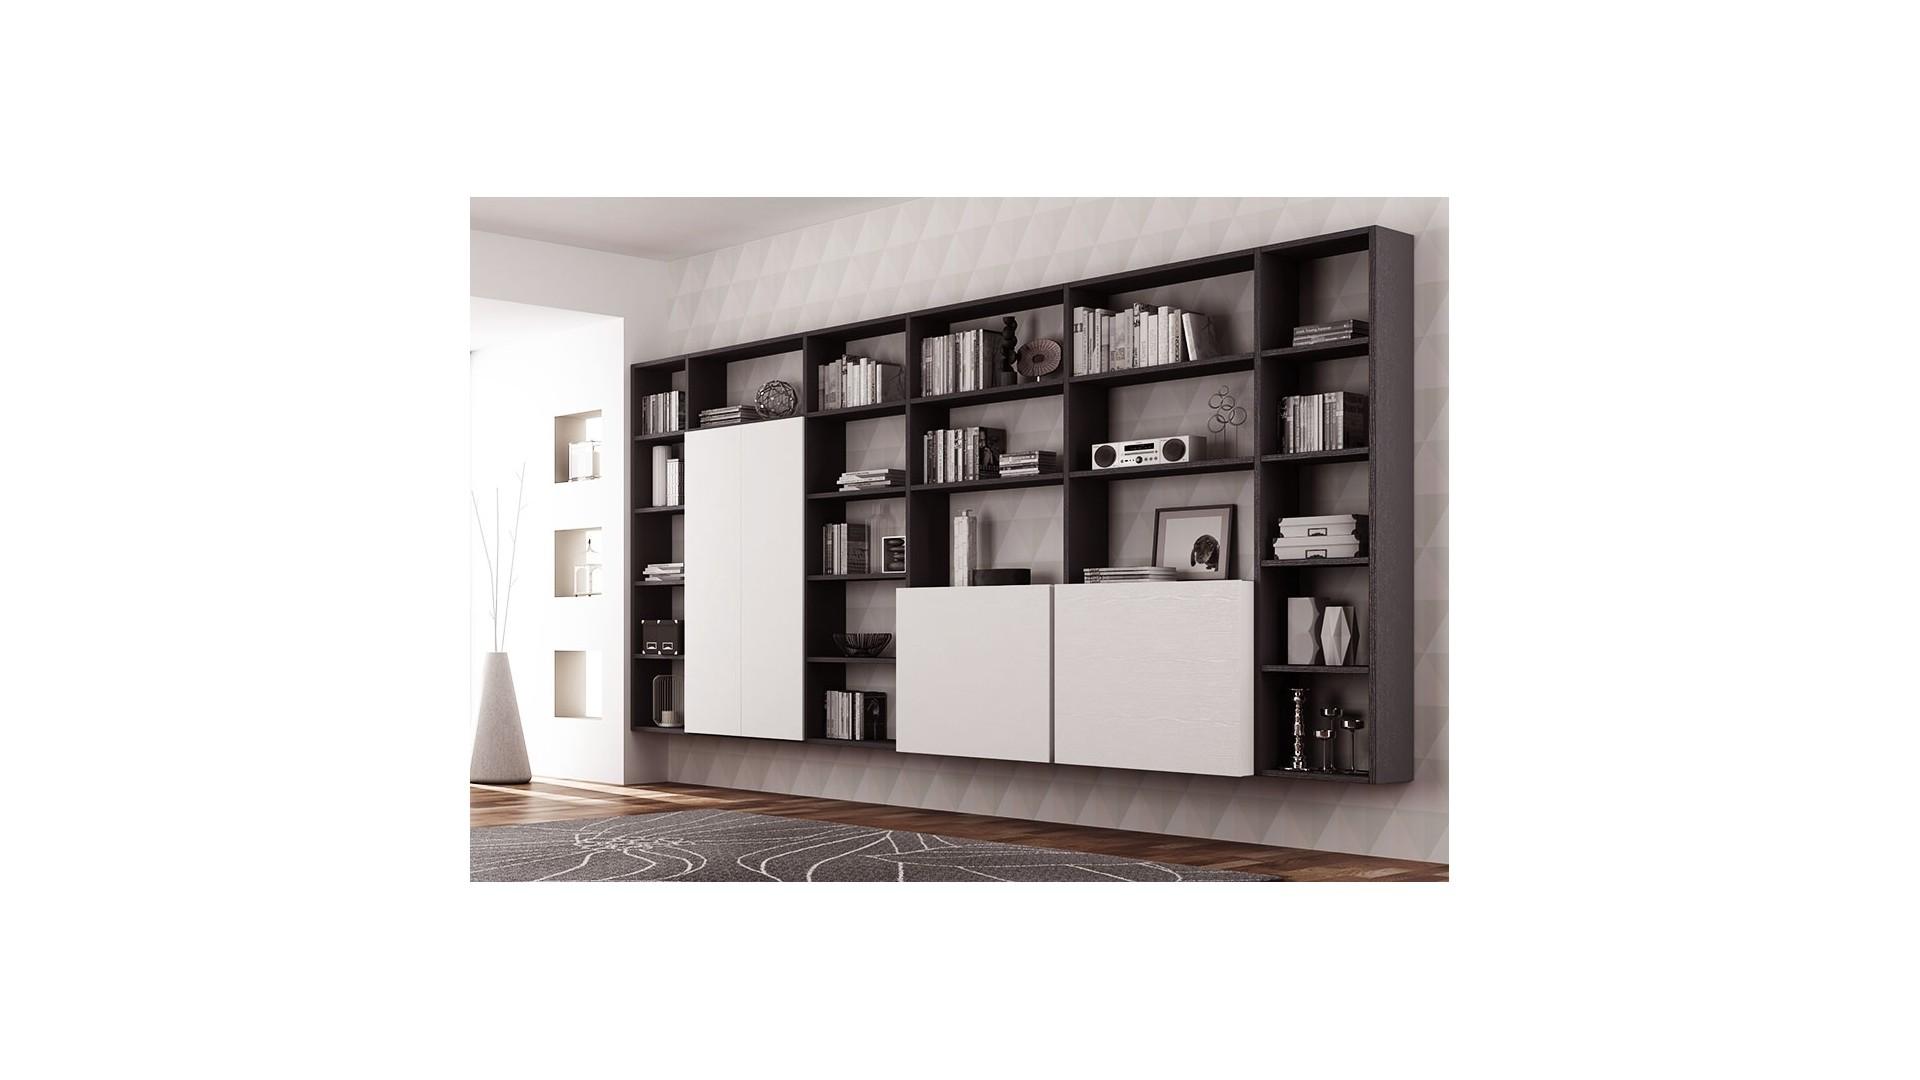 bibliotheque design personnalisable al16 suspendue avec portes ouverture push pull moretti compact